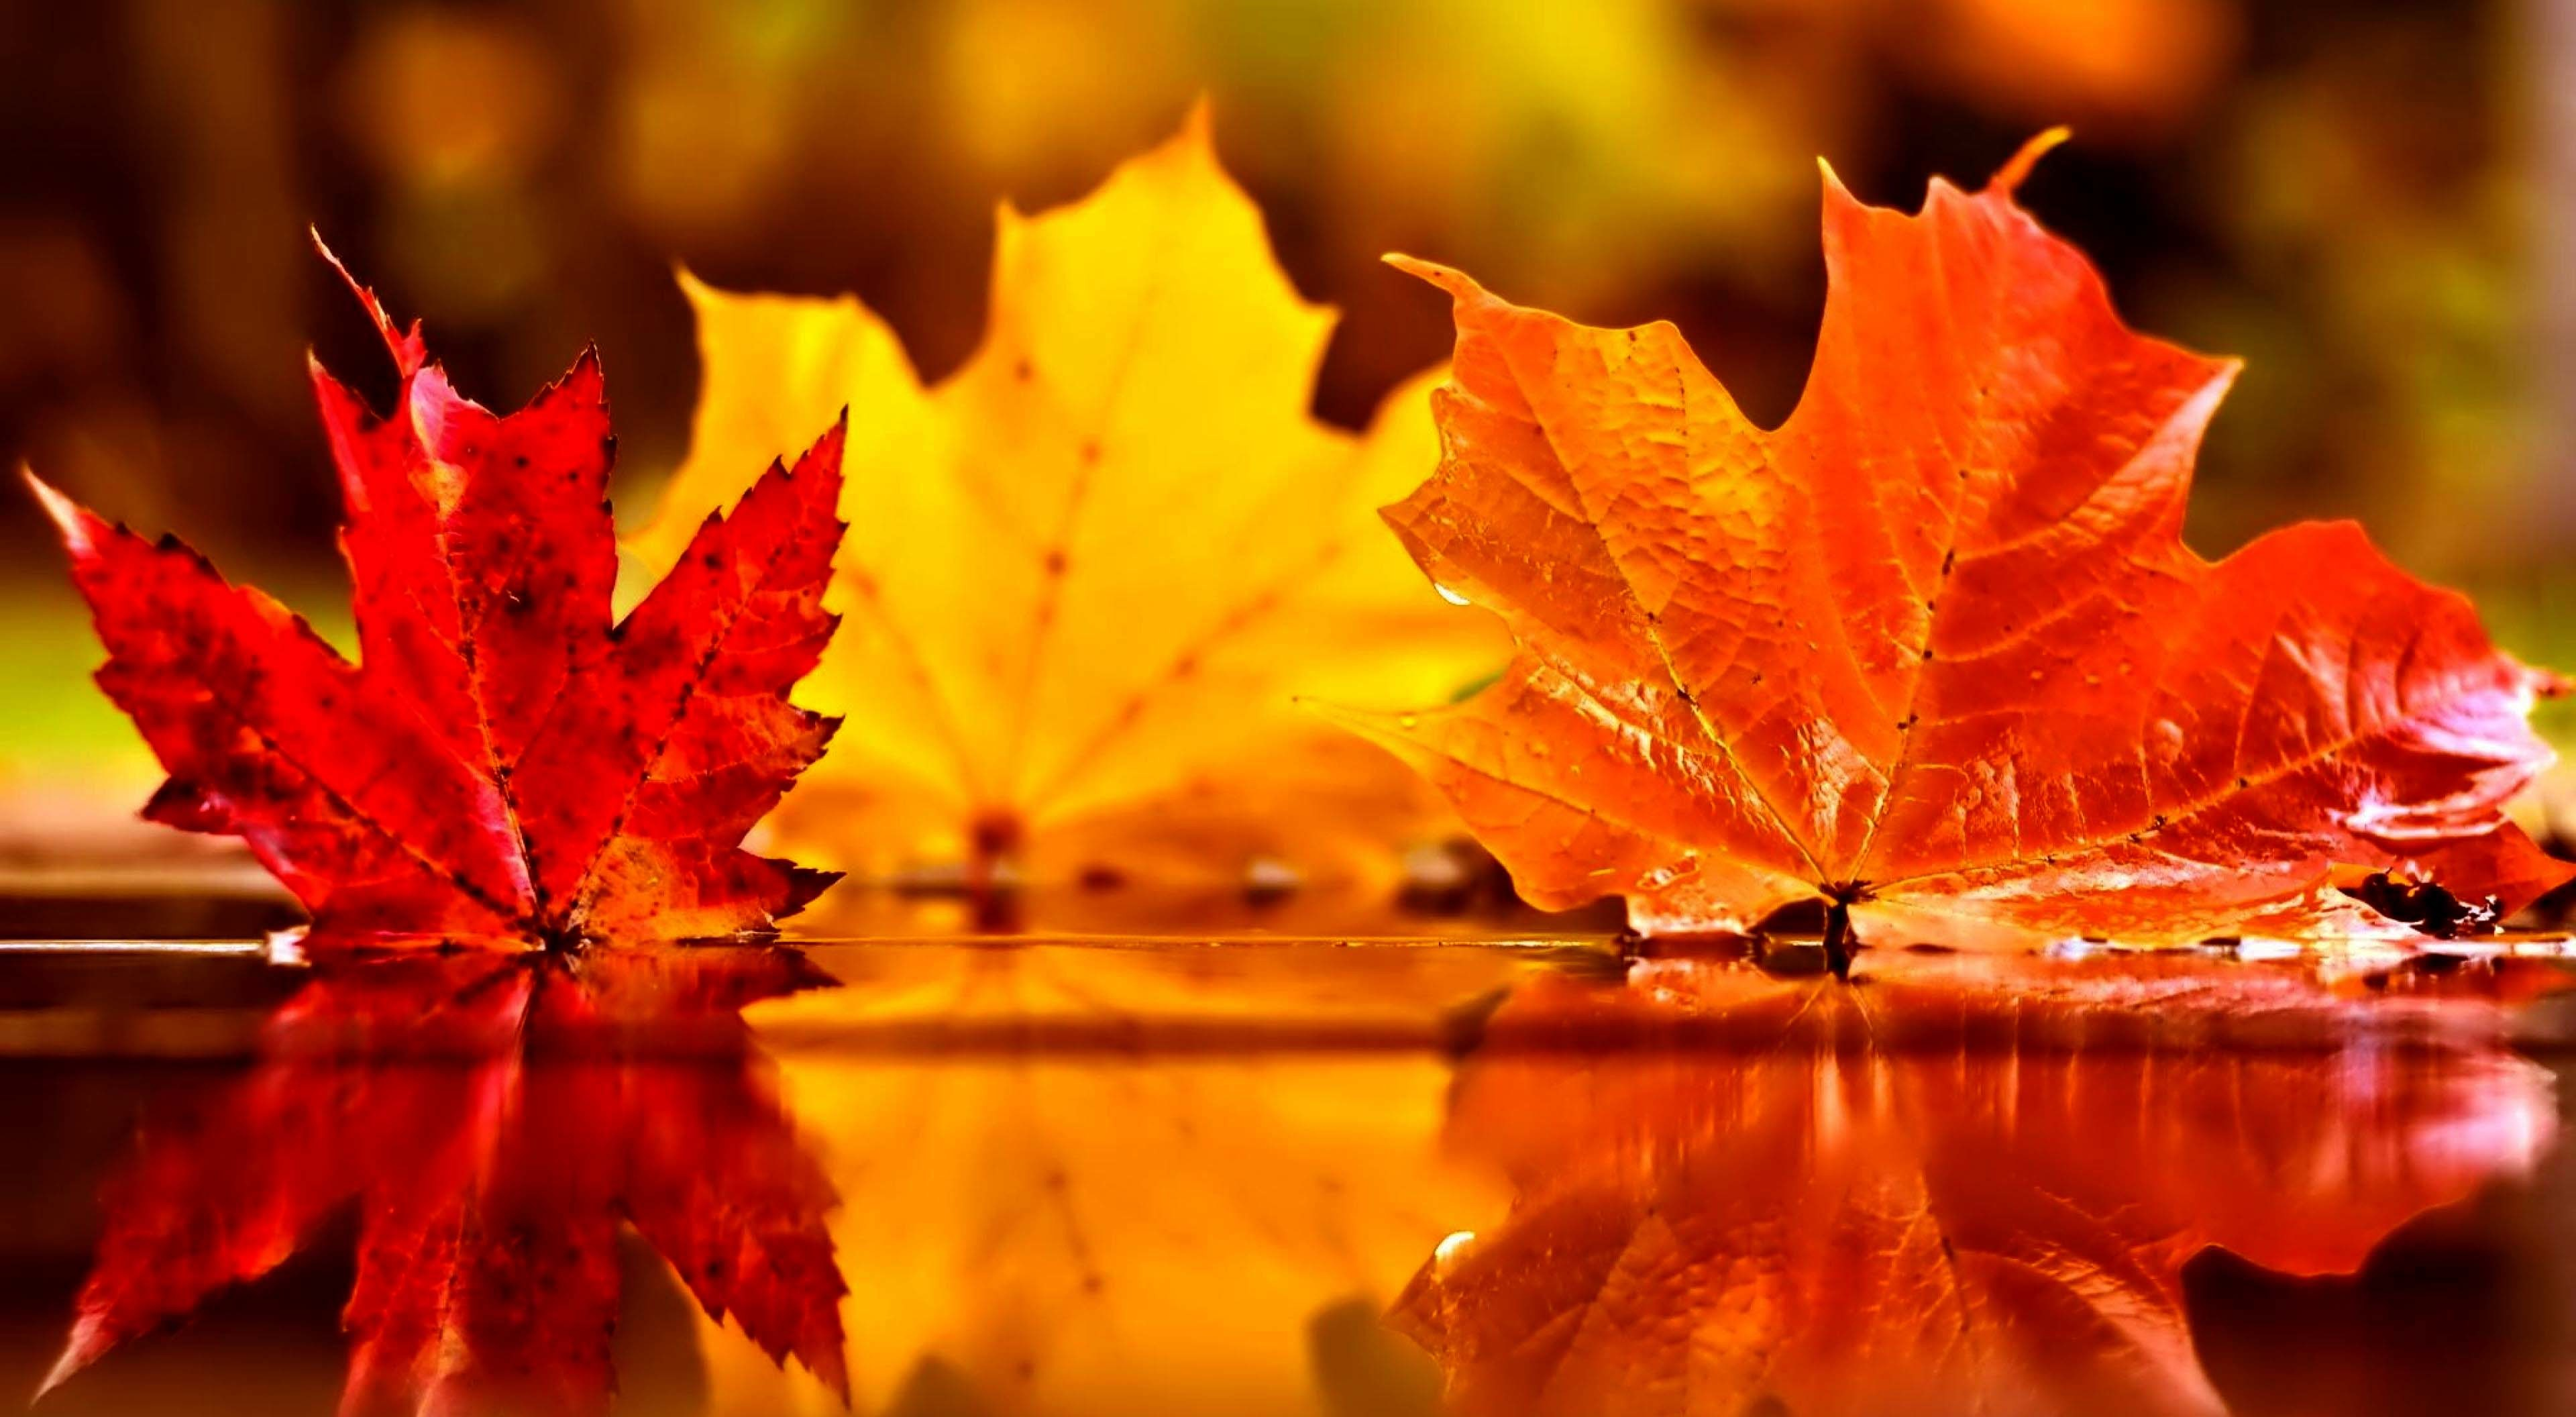 Cute Fall Pumpkins Wallpaper | Pumpkins Halloween Wallpaper Free Download |  Fall pictures | Pinterest | Timeline covers